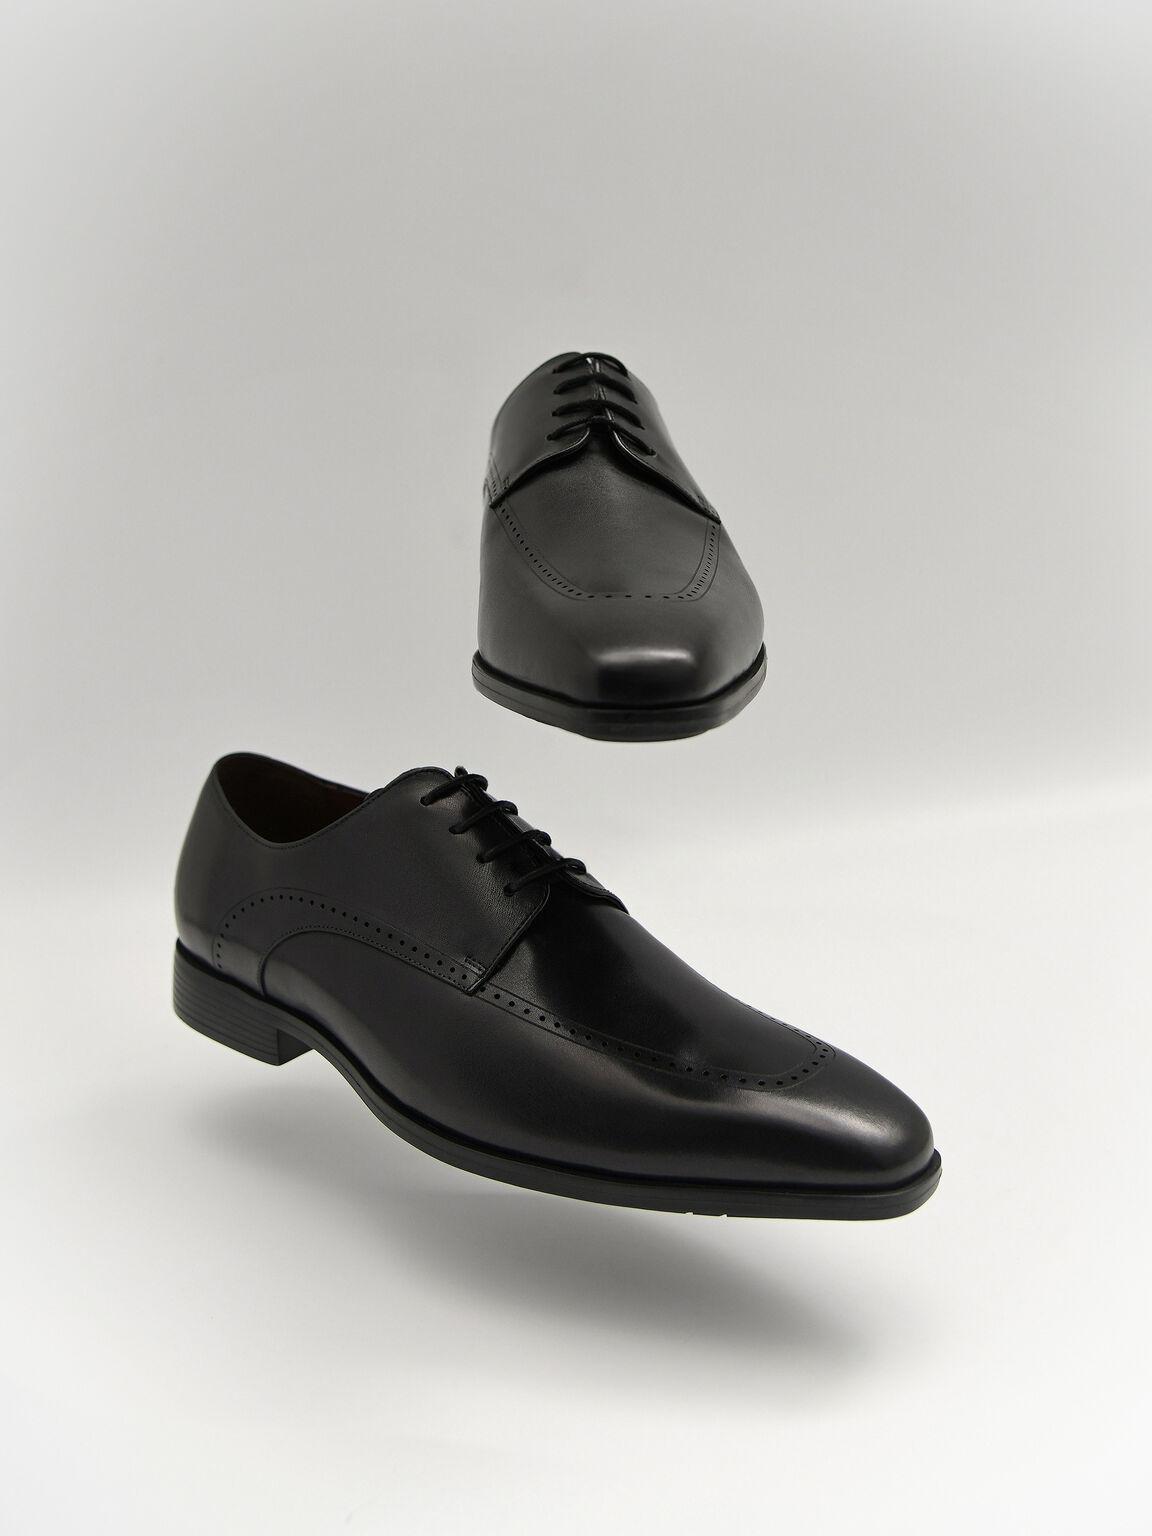 Altitude Leather Brogue Derby Shoes, Black, hi-res